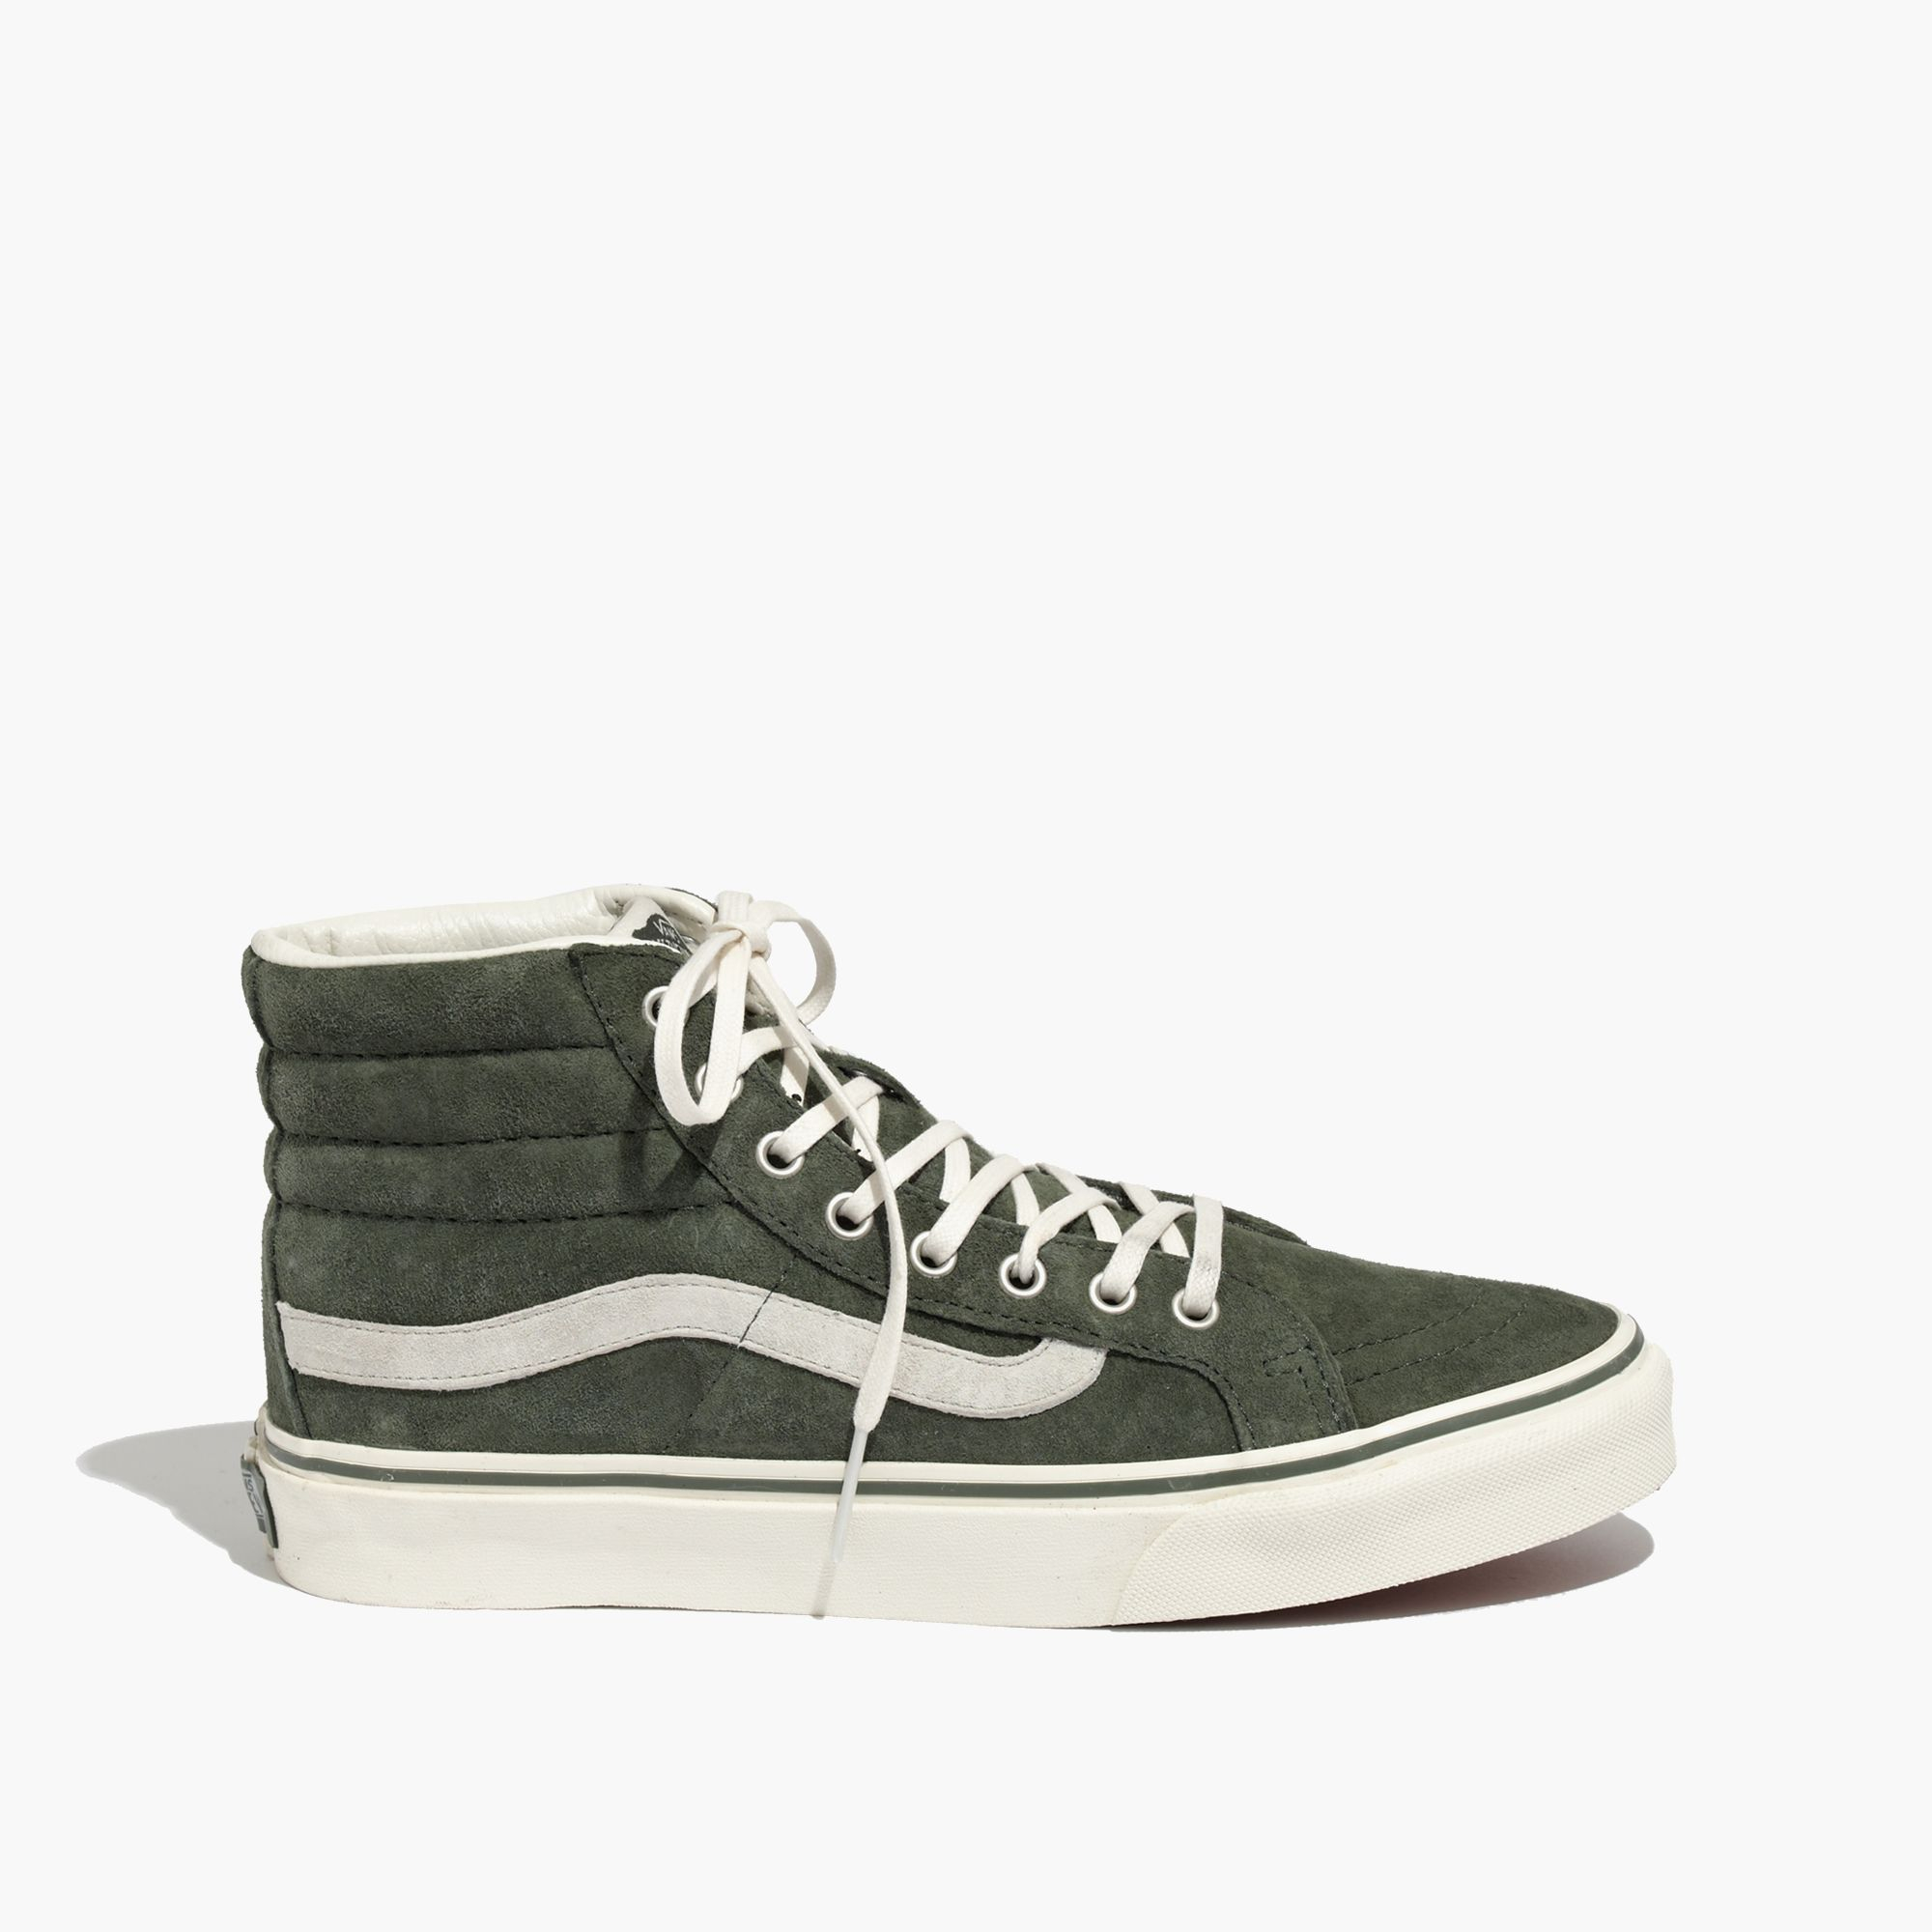 6ce2d36c513163 Madewell Vans Reg  Sk8-Hi Slim High-Tops In Suede in Green - Lyst